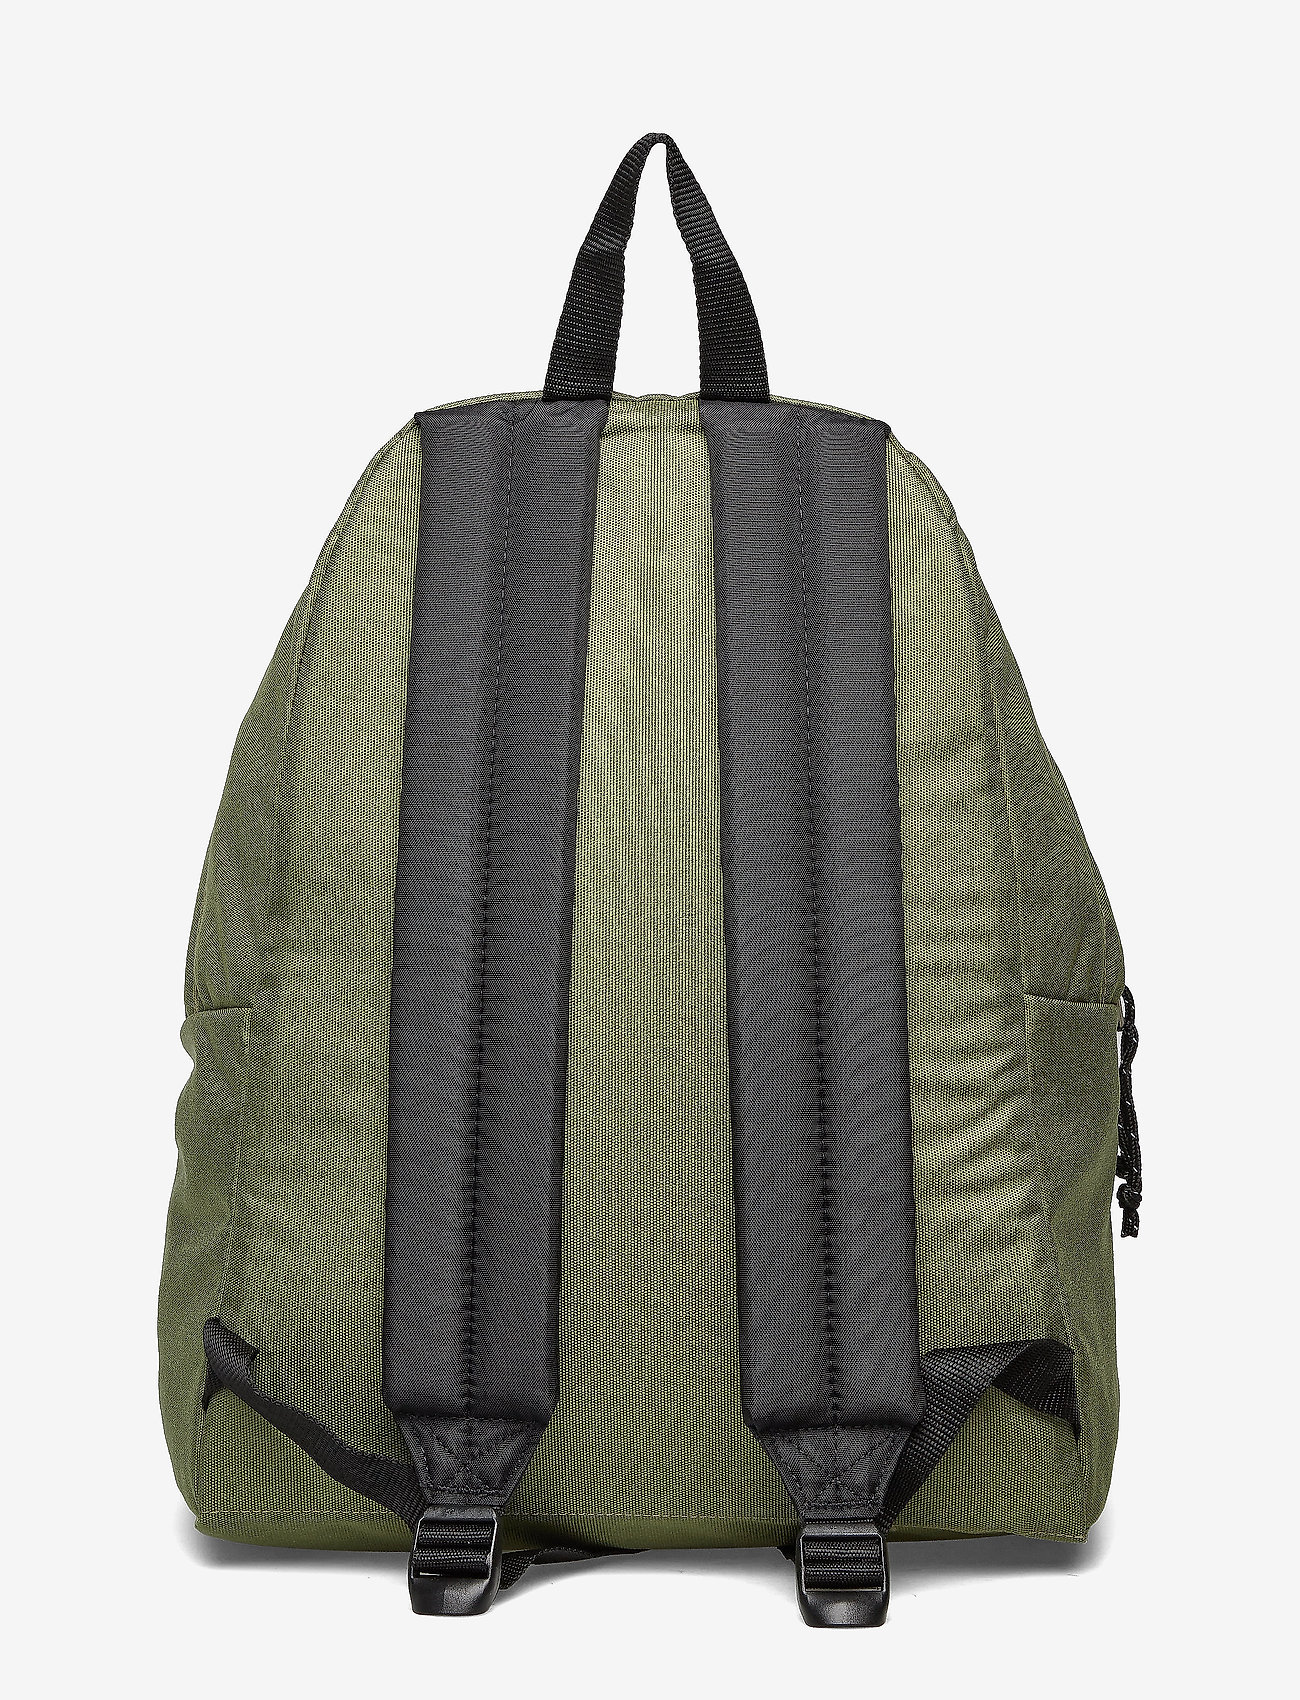 Eastpak - PADDED PAK'R - ryggsäckar - quiet khaki - 1